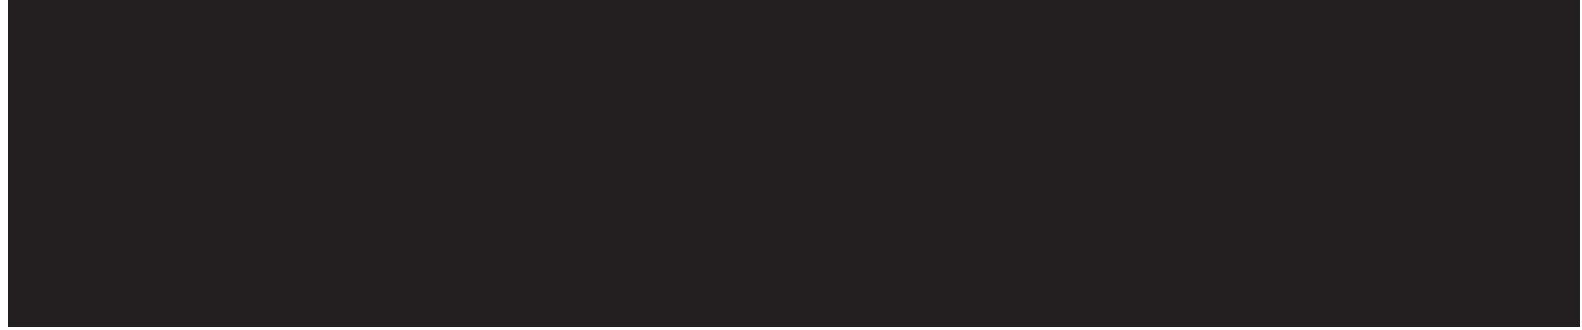 Ranco Guppy 4100 Cubic Ft Storage Silo Drawing